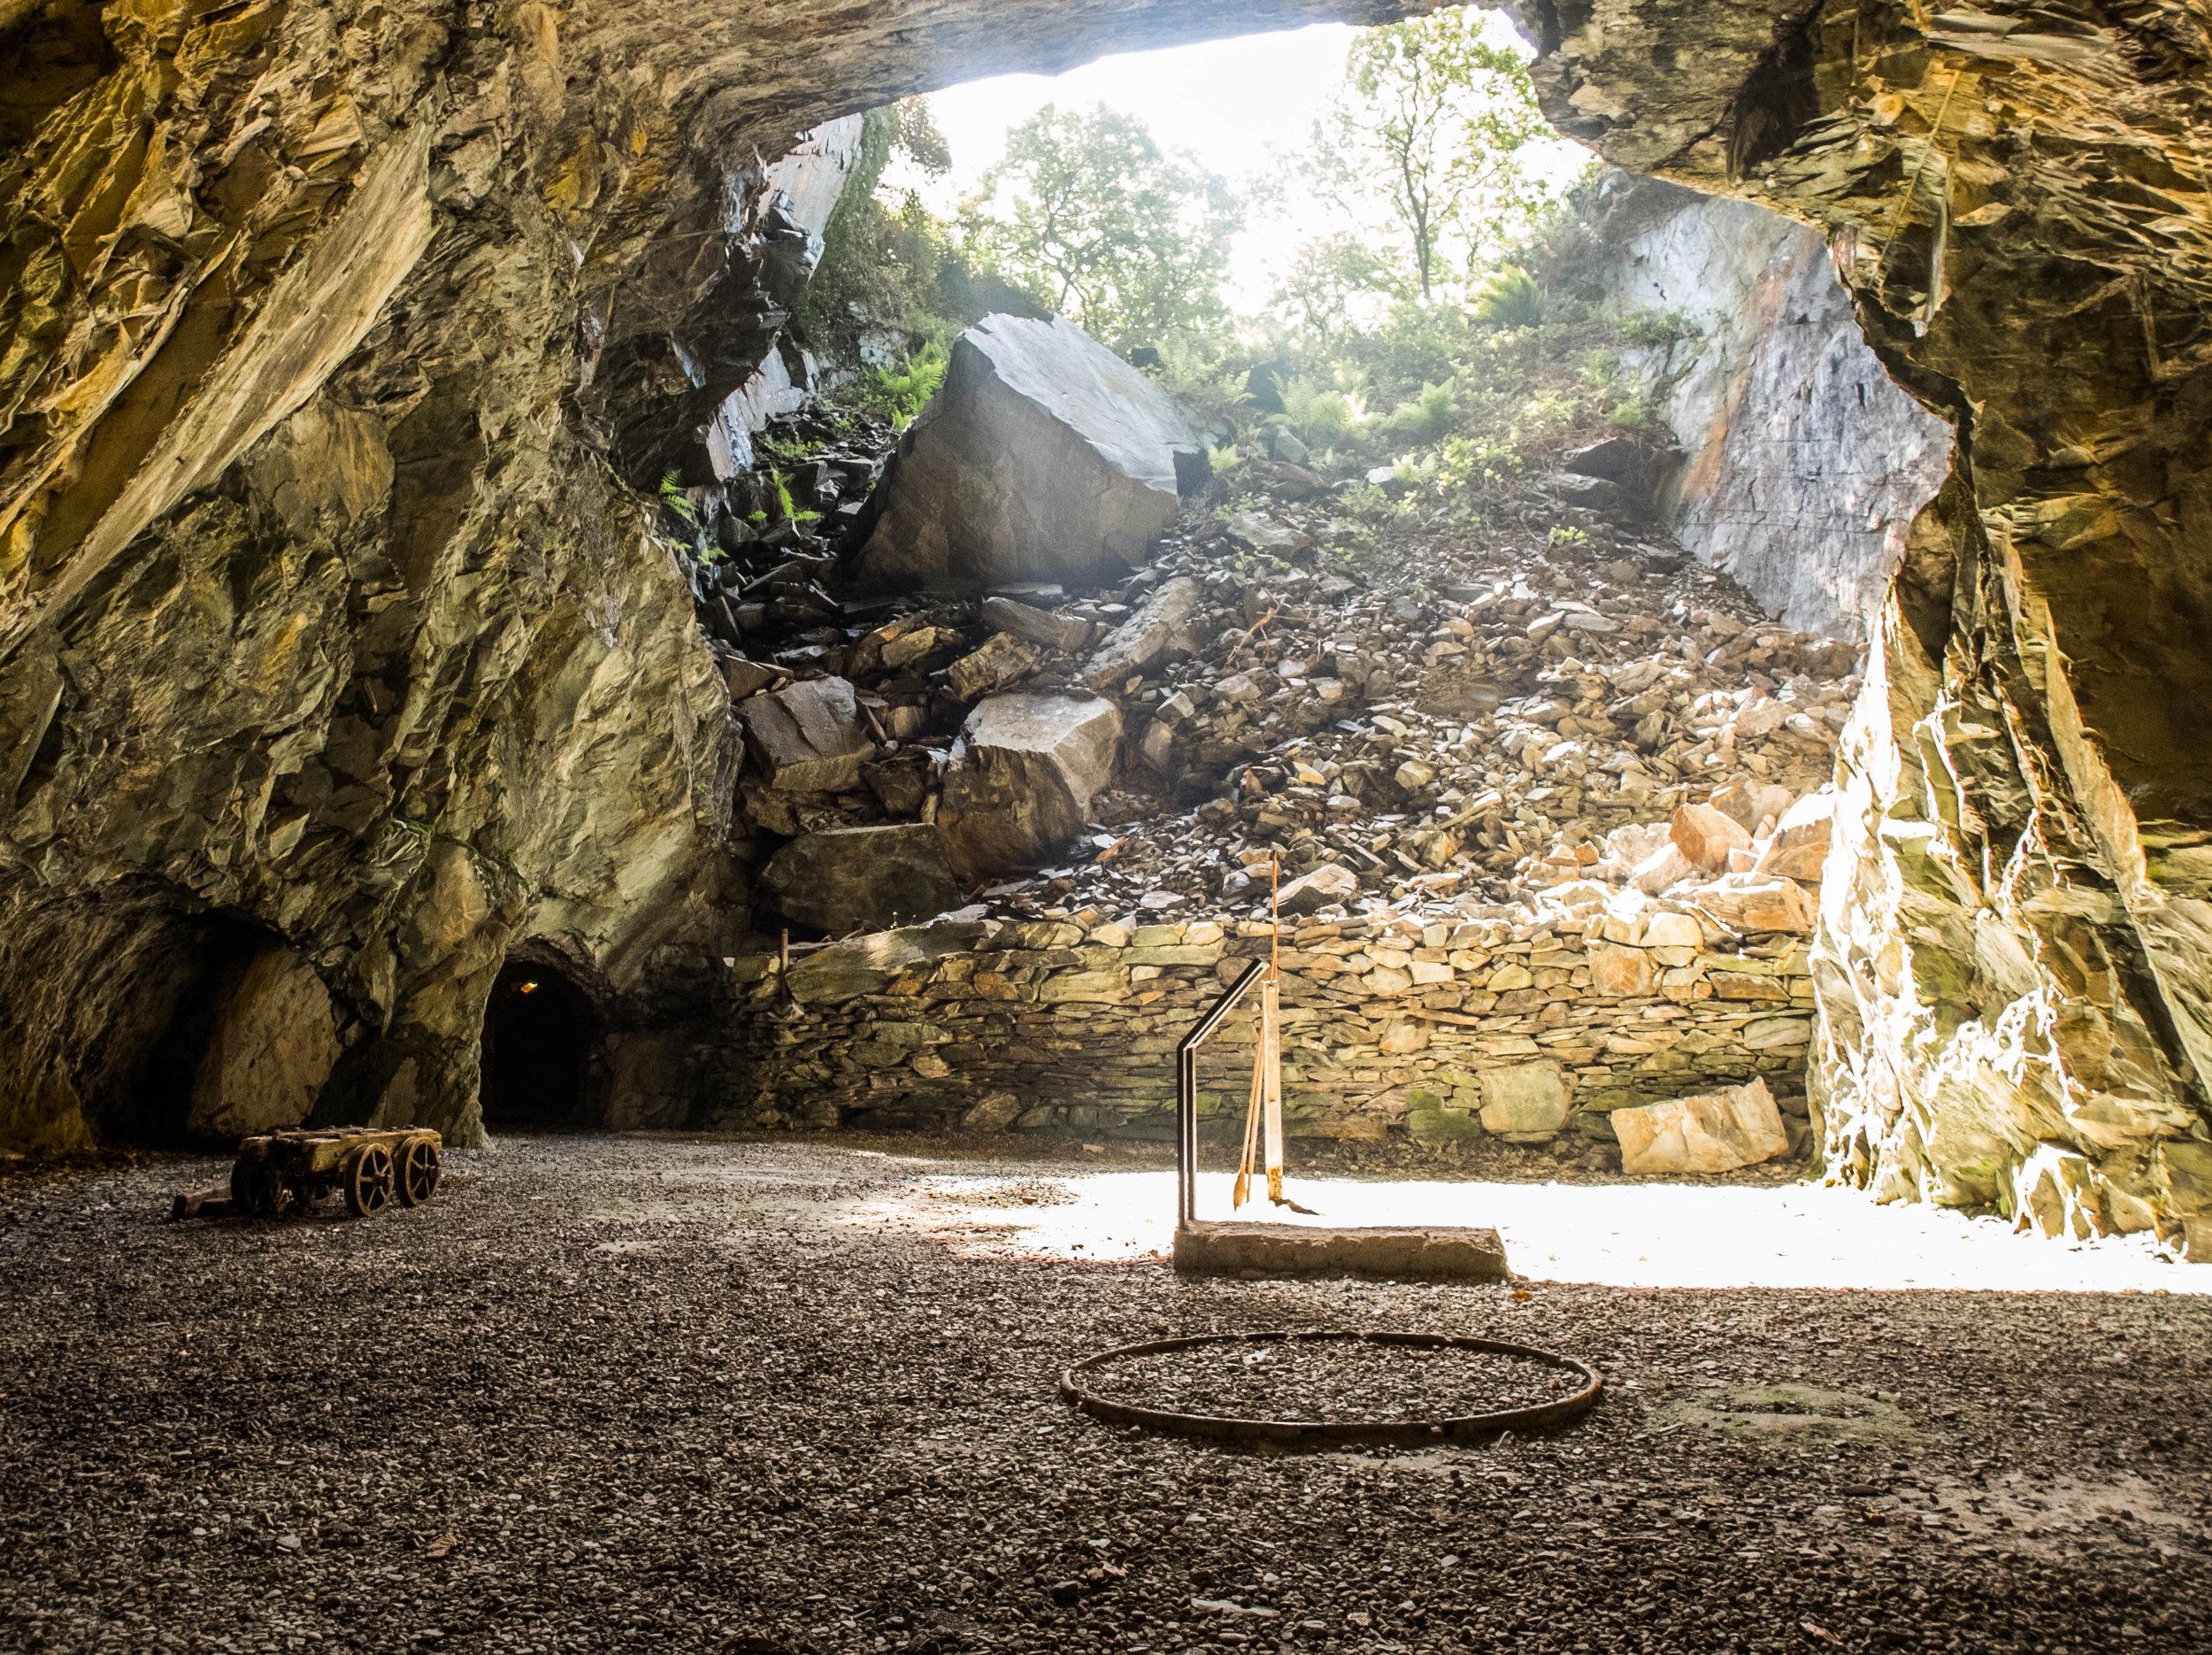 Inside the Llanfair slate caverns